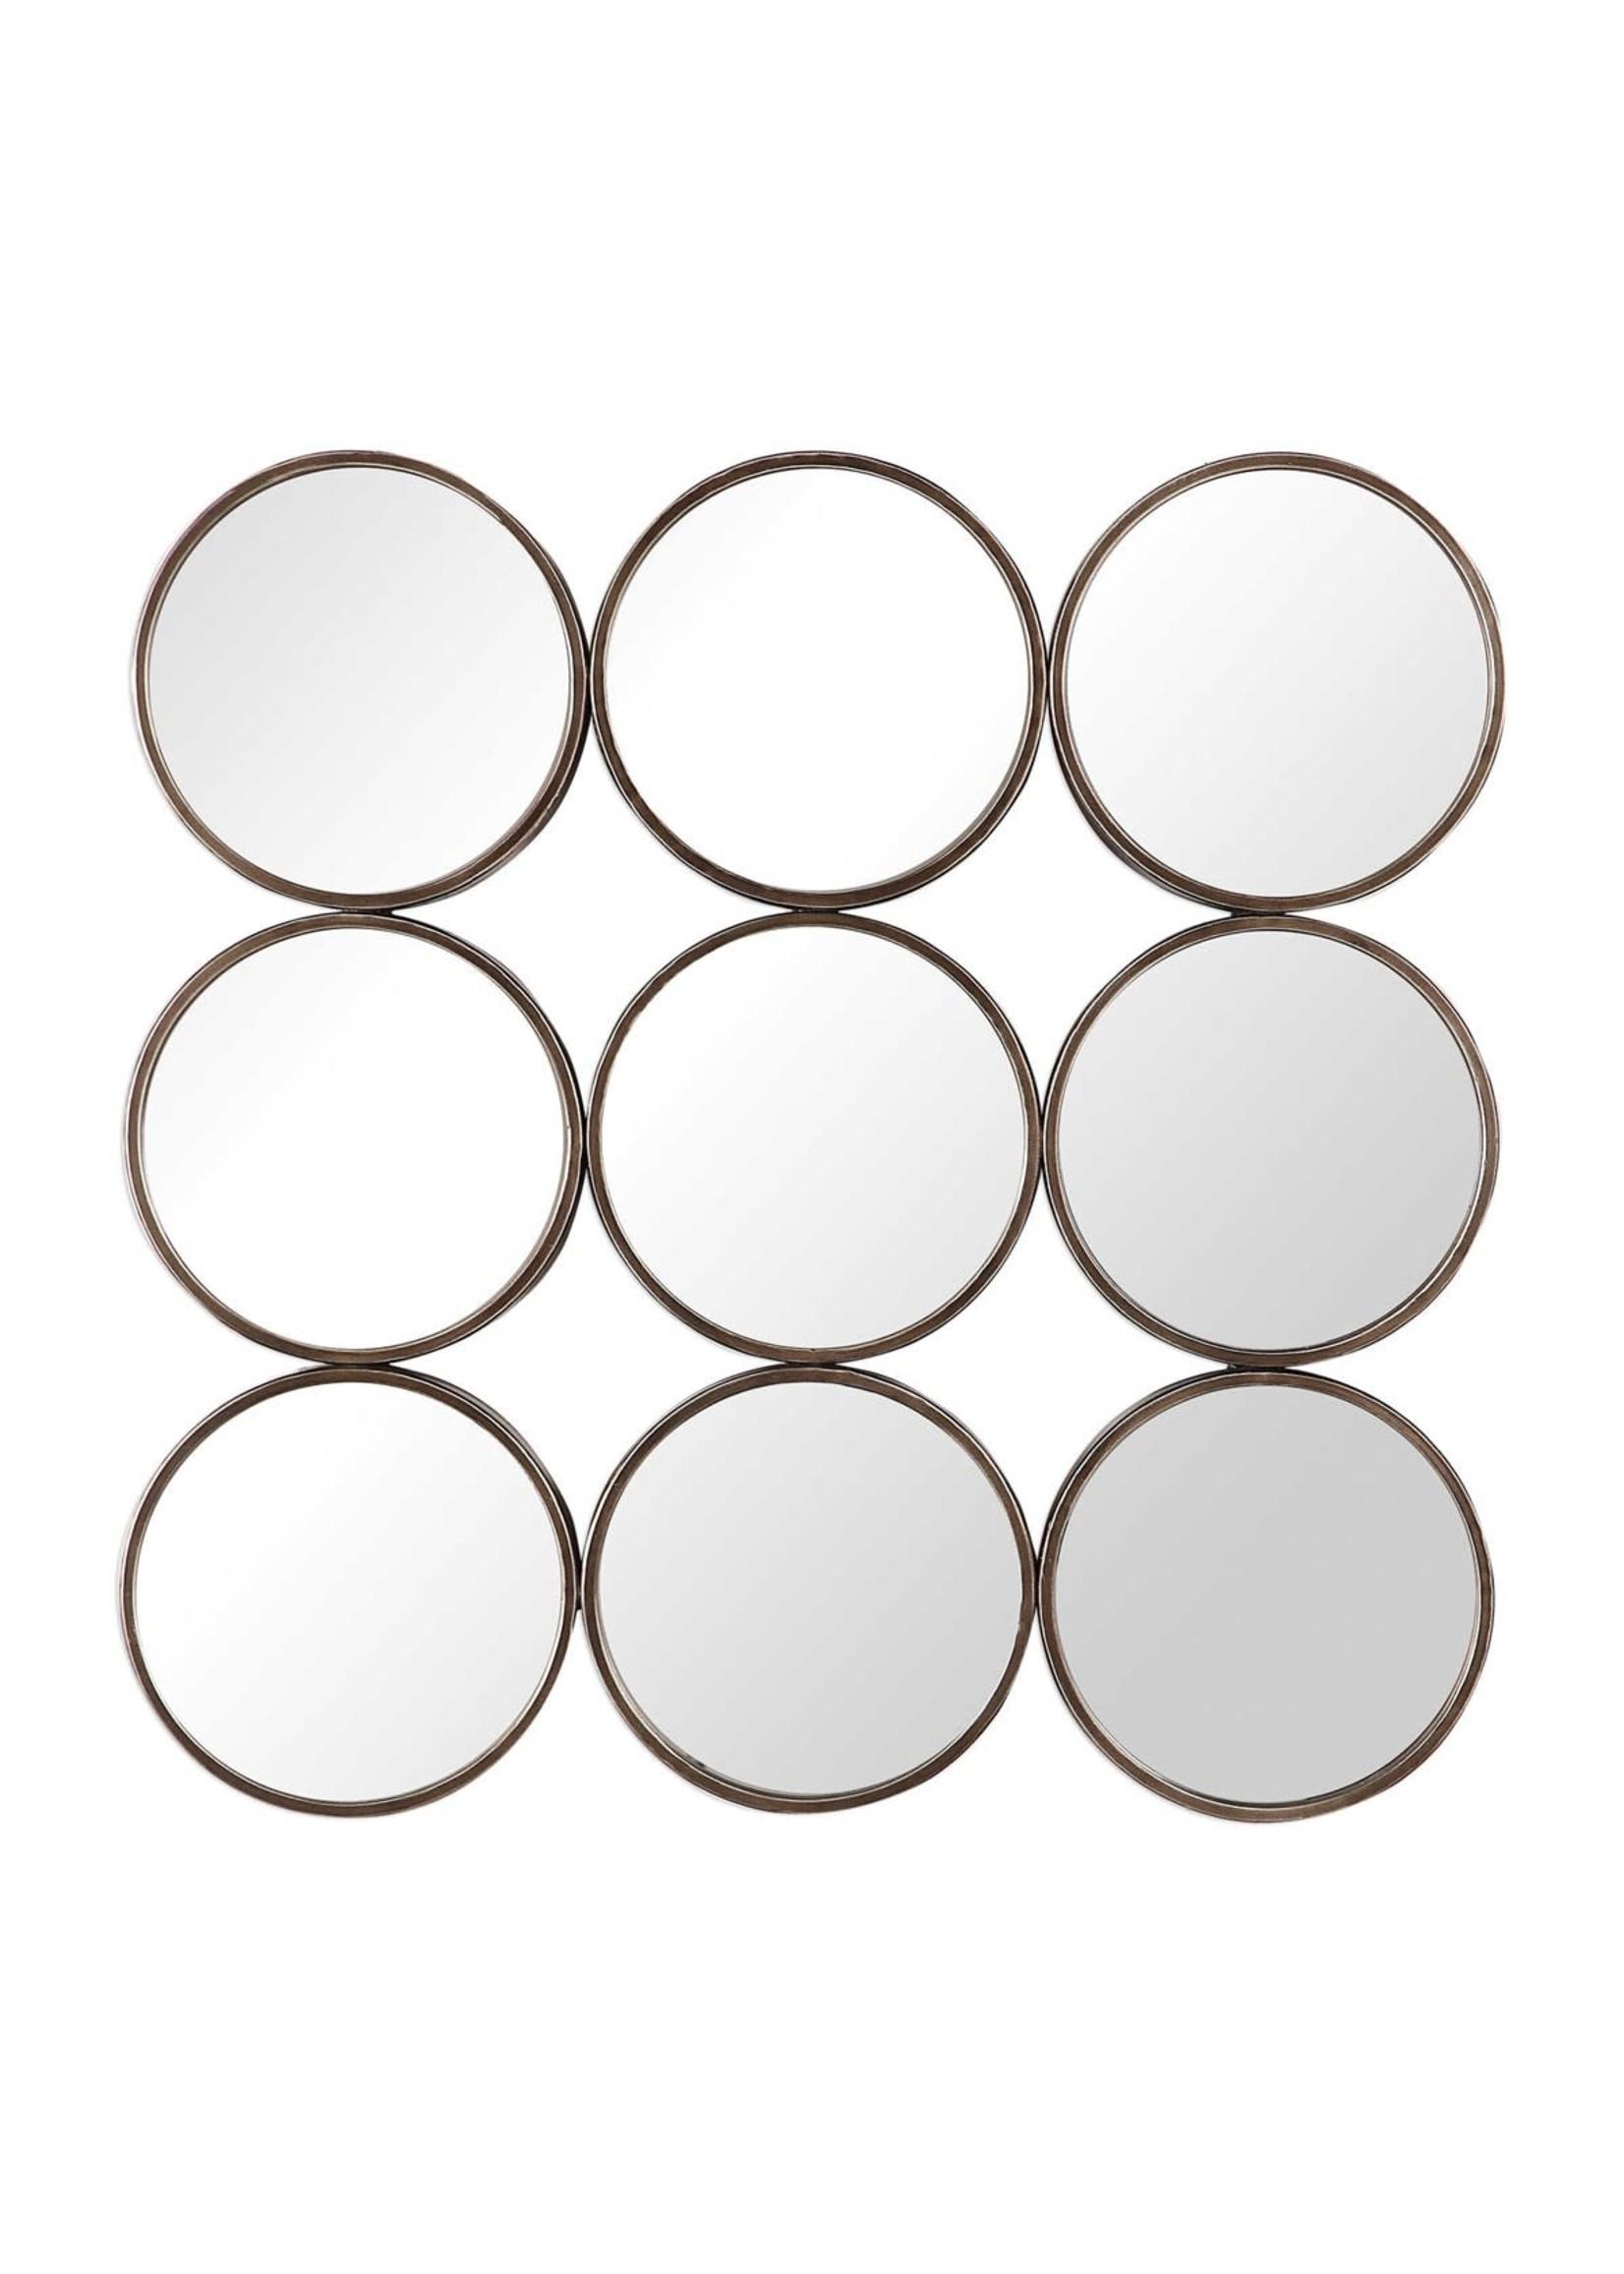 Devet Mirror 36x36